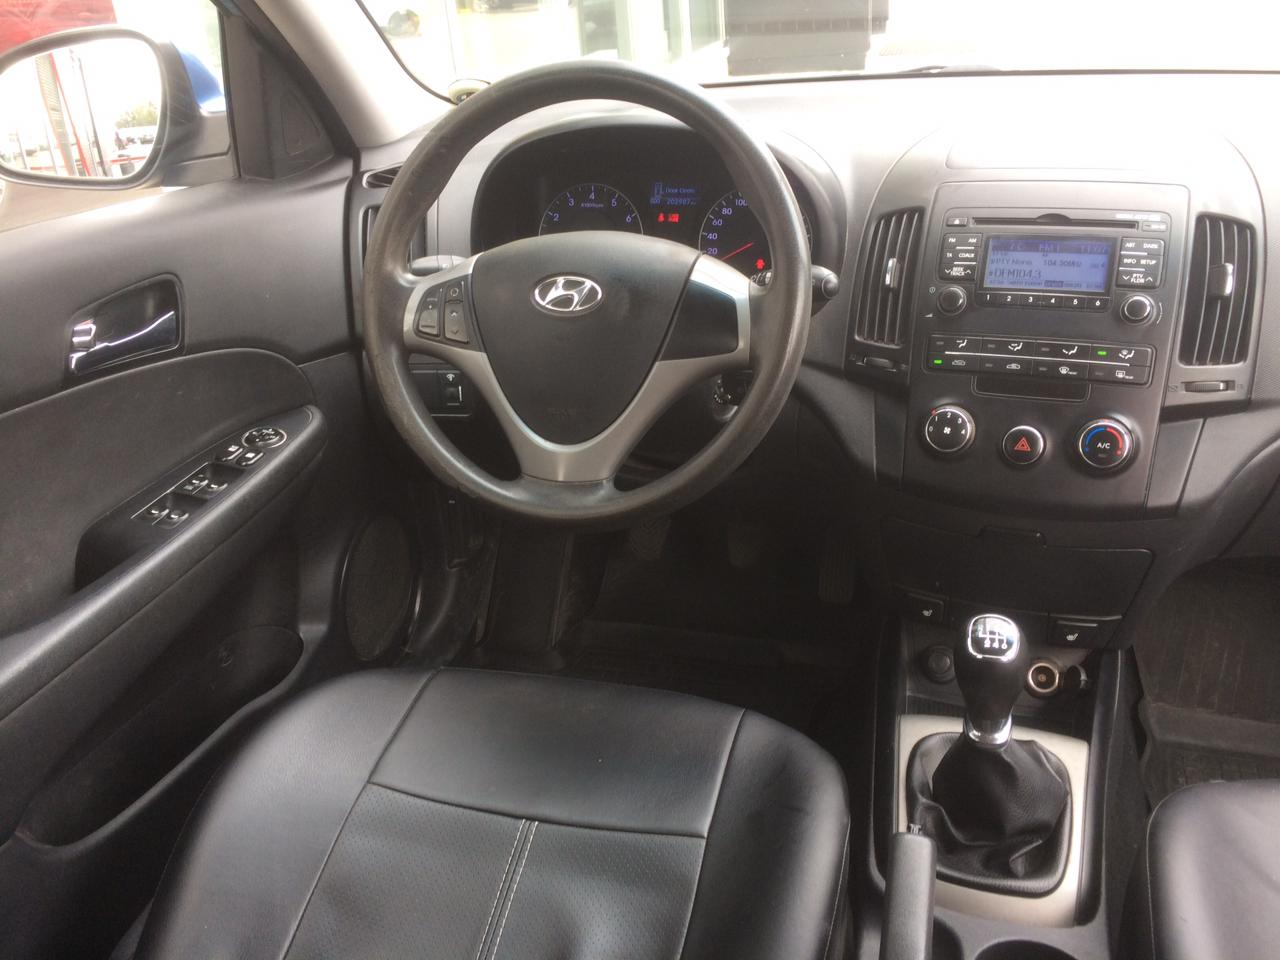 Hyundai   i30, I Рестайлинг